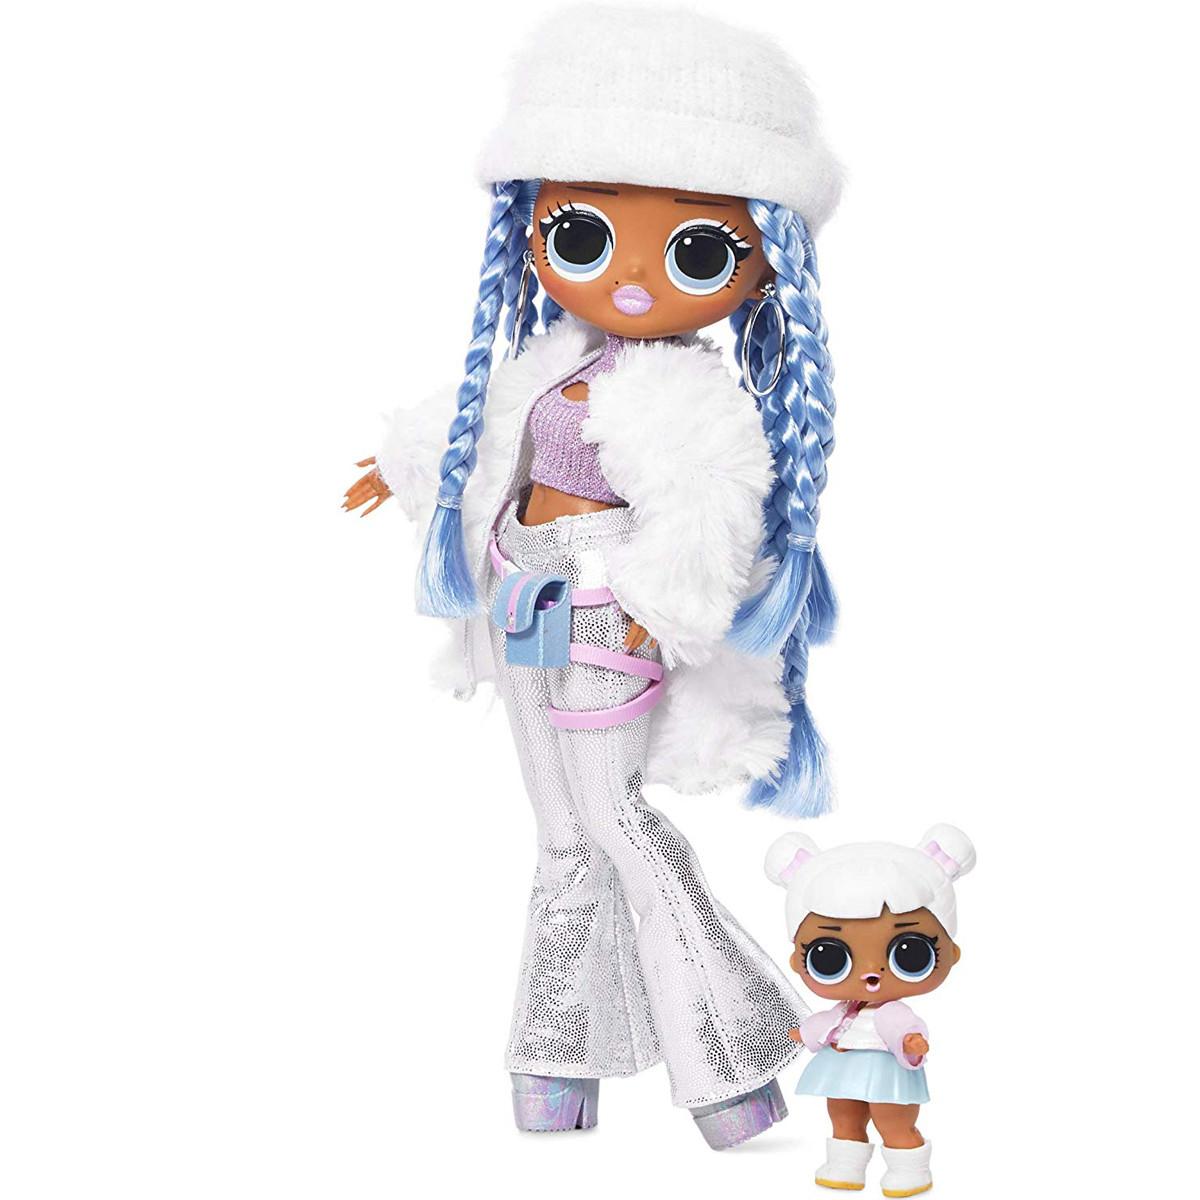 Кукла ЛОЛ ОМГ Снежный ангел Зимнее диско L.O.L. Surprise! O.M.G. Winter Disco Snowlicious